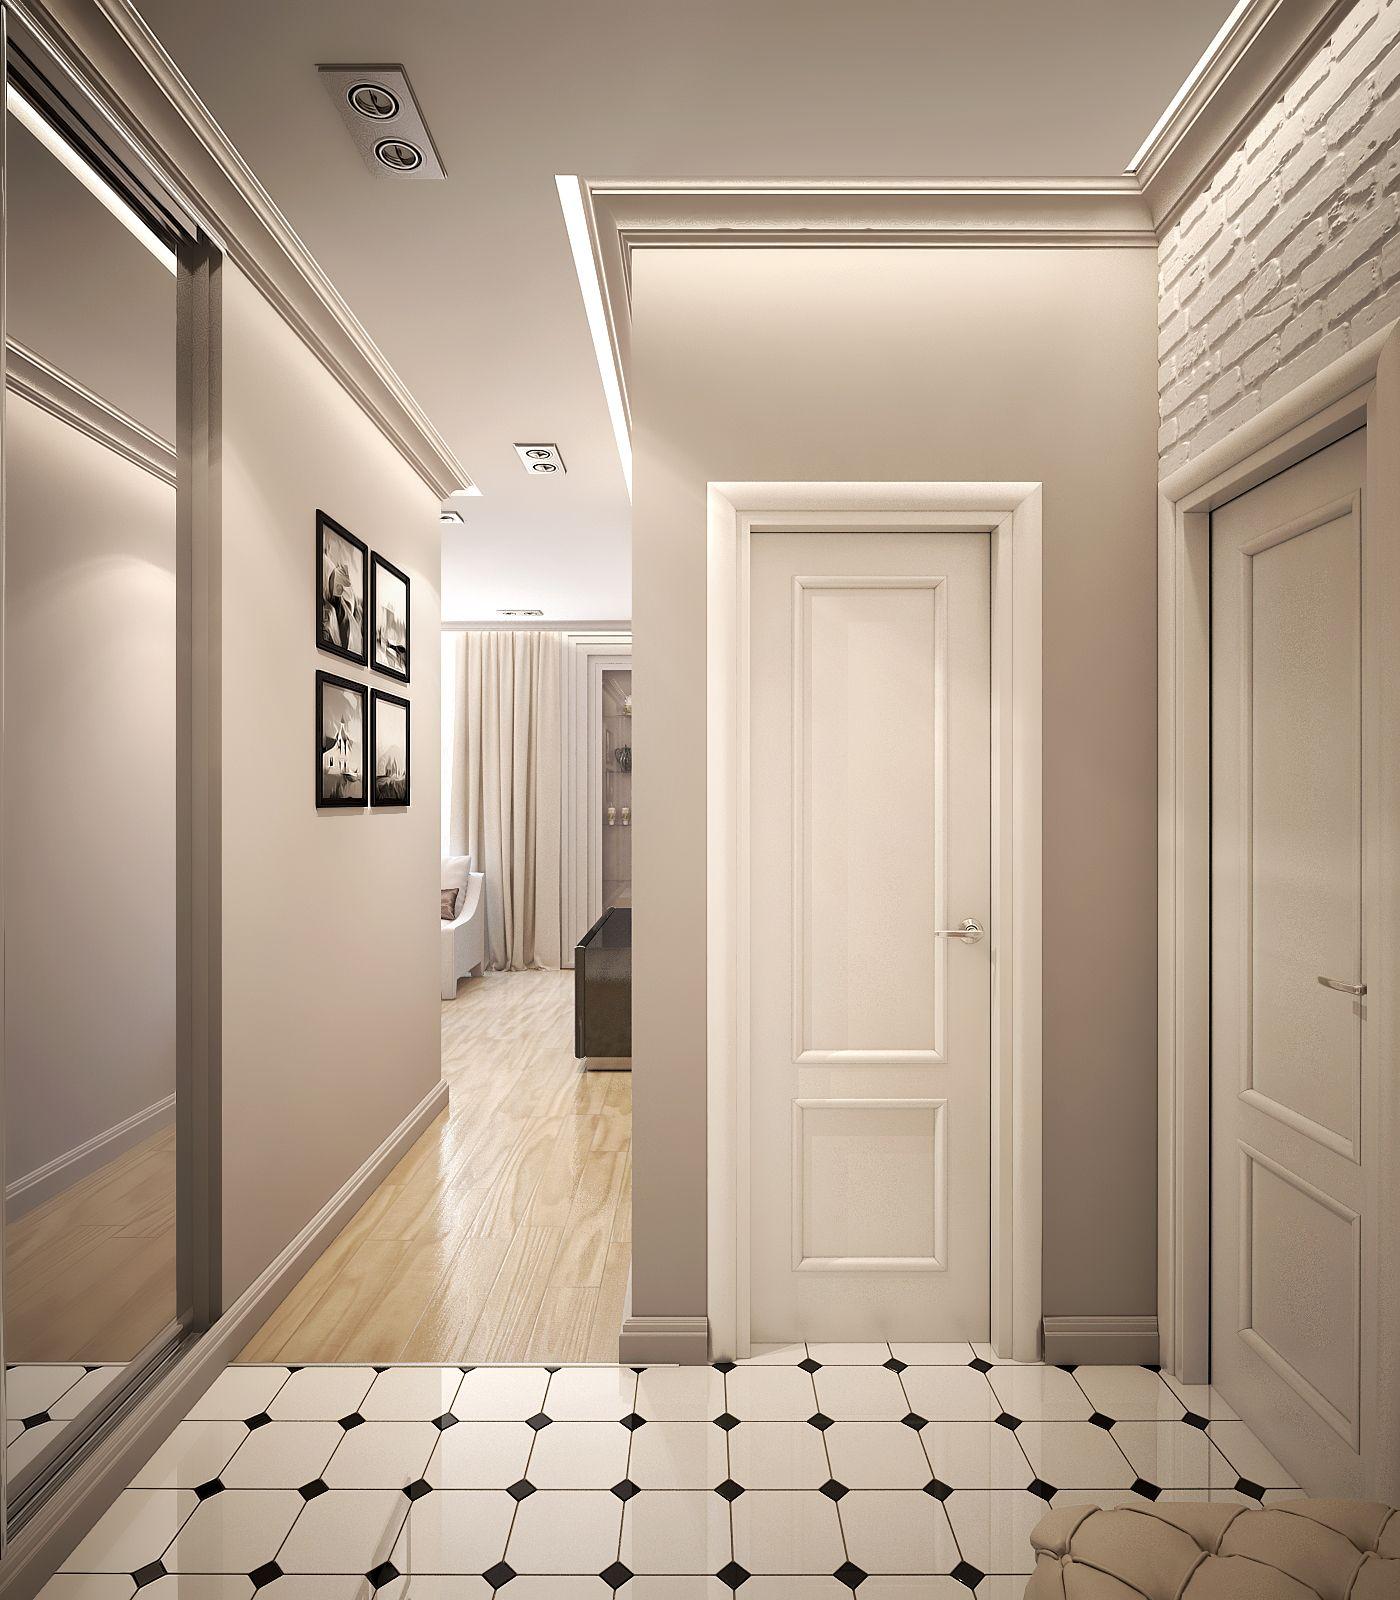 Prihozhaya Prihozhaya Contemporary Living Room Design Home Room Design Corridor Design